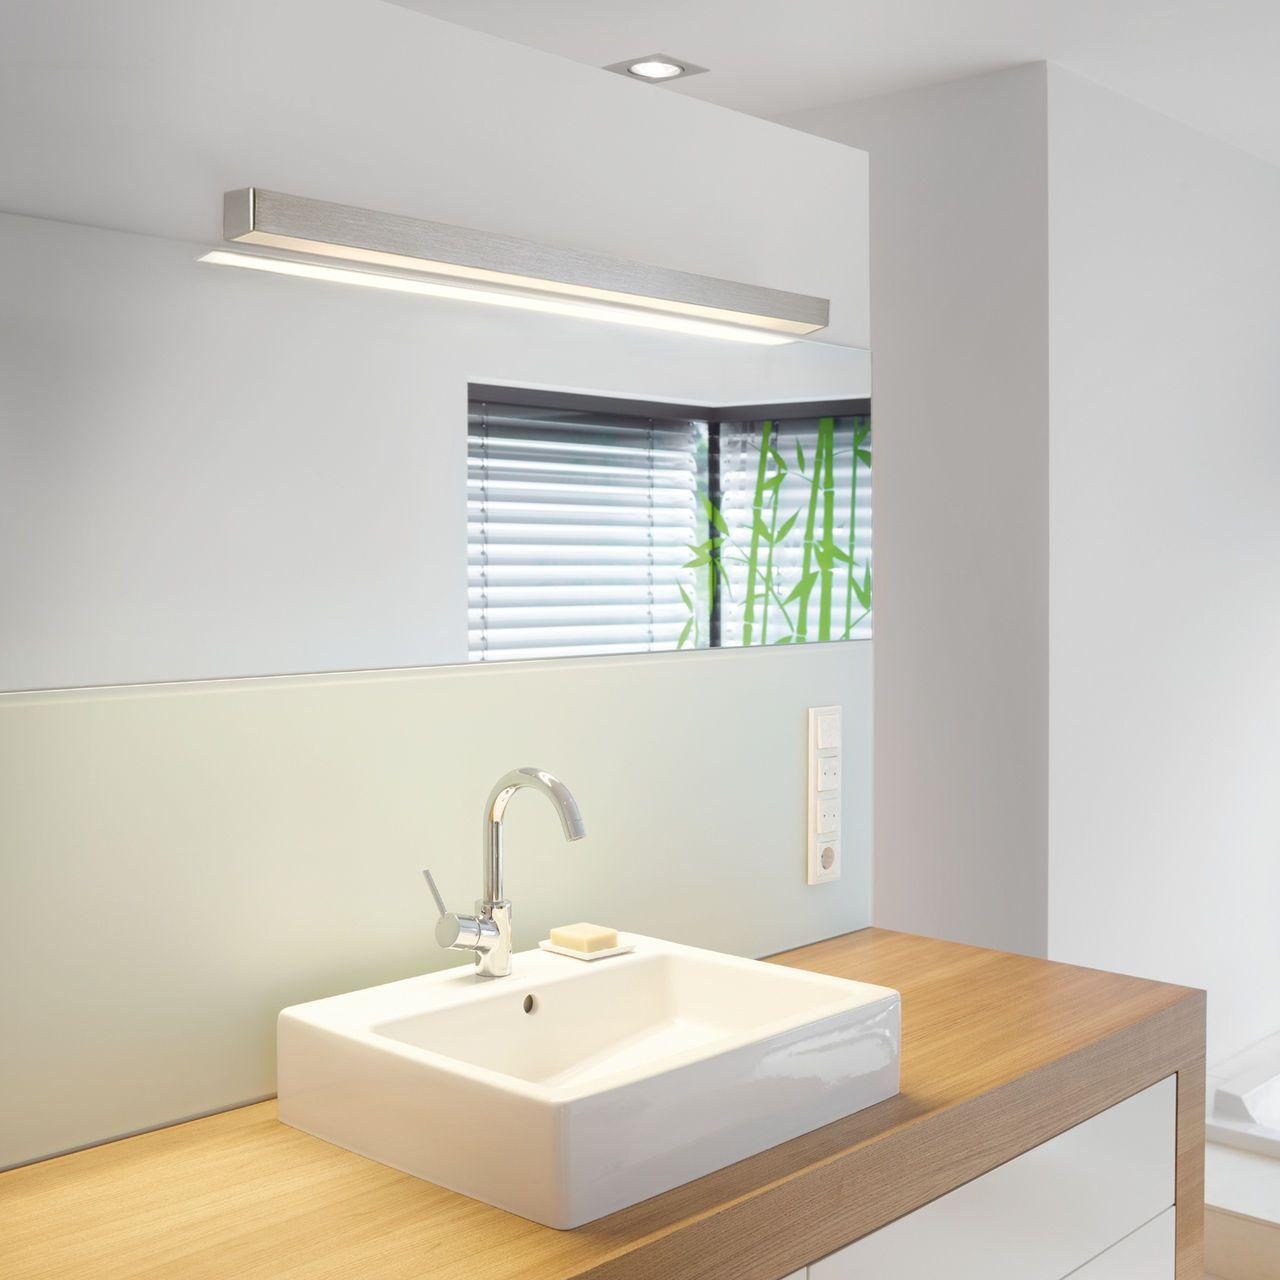 Wandlampe sedo bad wellness badezimmer lampe badezimmer und badezimmer wand - Badezimmer wandlampe ...